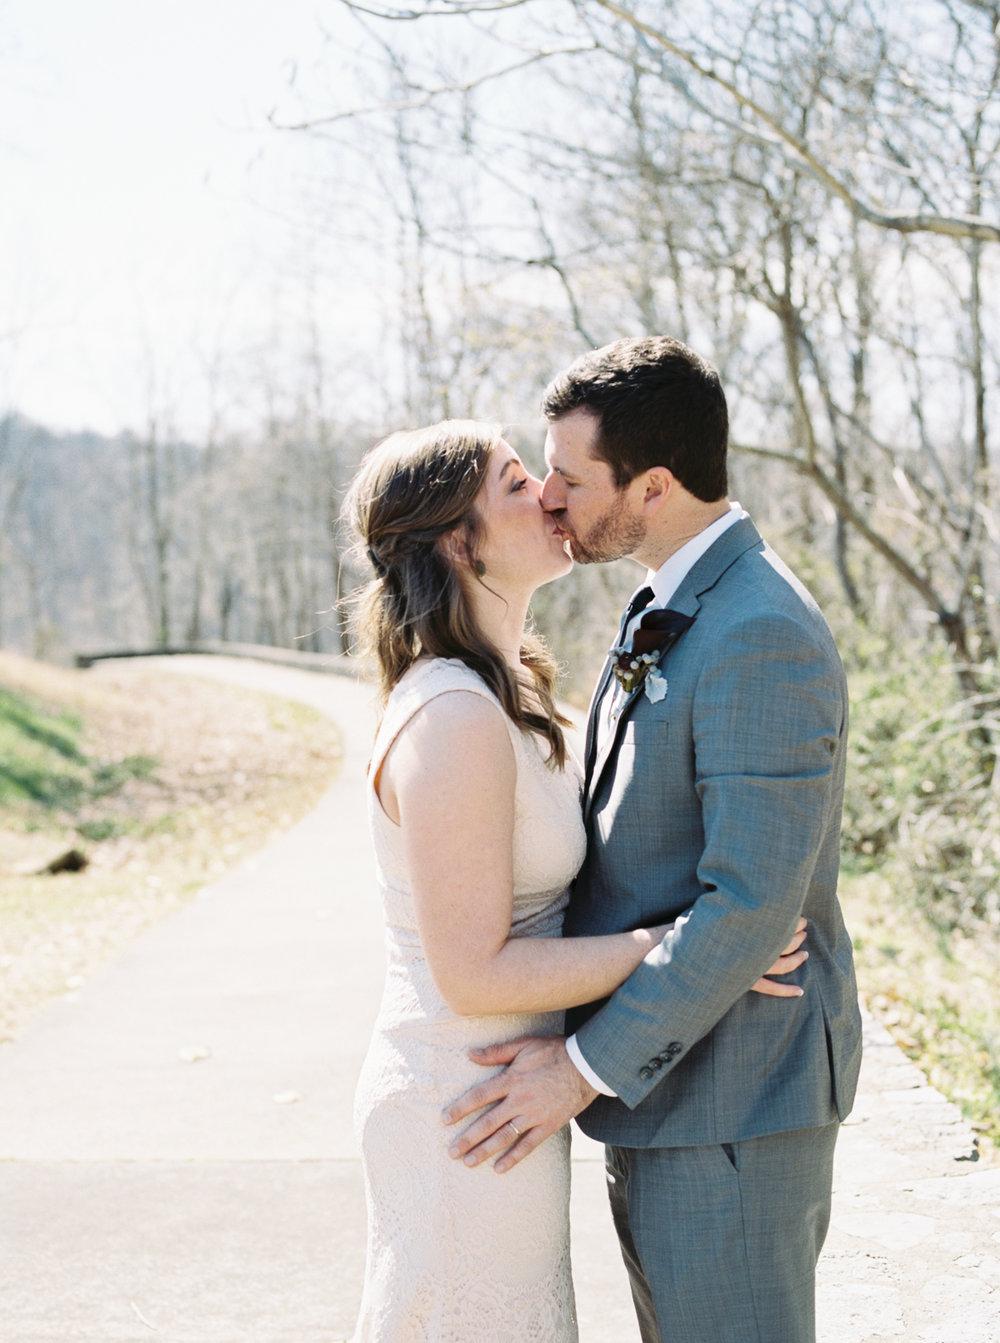 laurel+kelly_natchez_trace_grays_on_main_franklin_film_wedding_photographers©2017abigailbobophotography-2-2.jpg